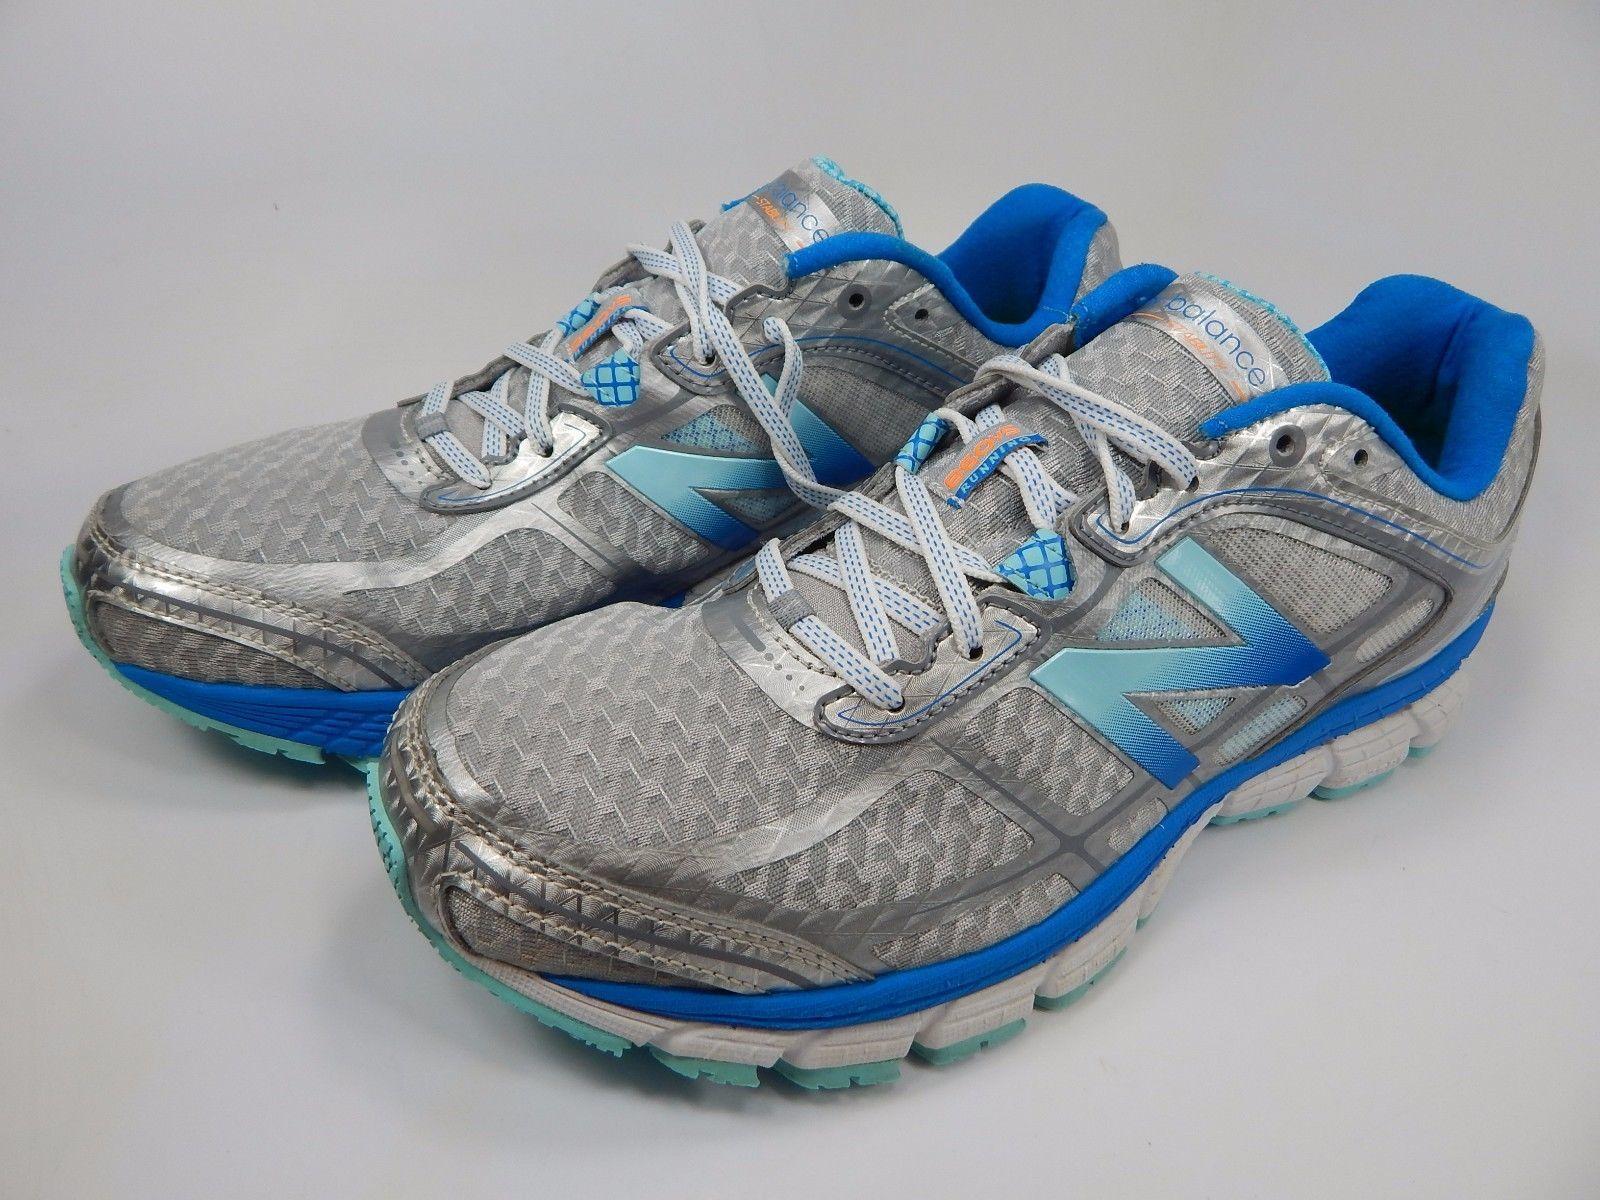 New Balance 860 v5 Women's Running Shoes Size US 12 M (B) EU 44 Silver W860SB5